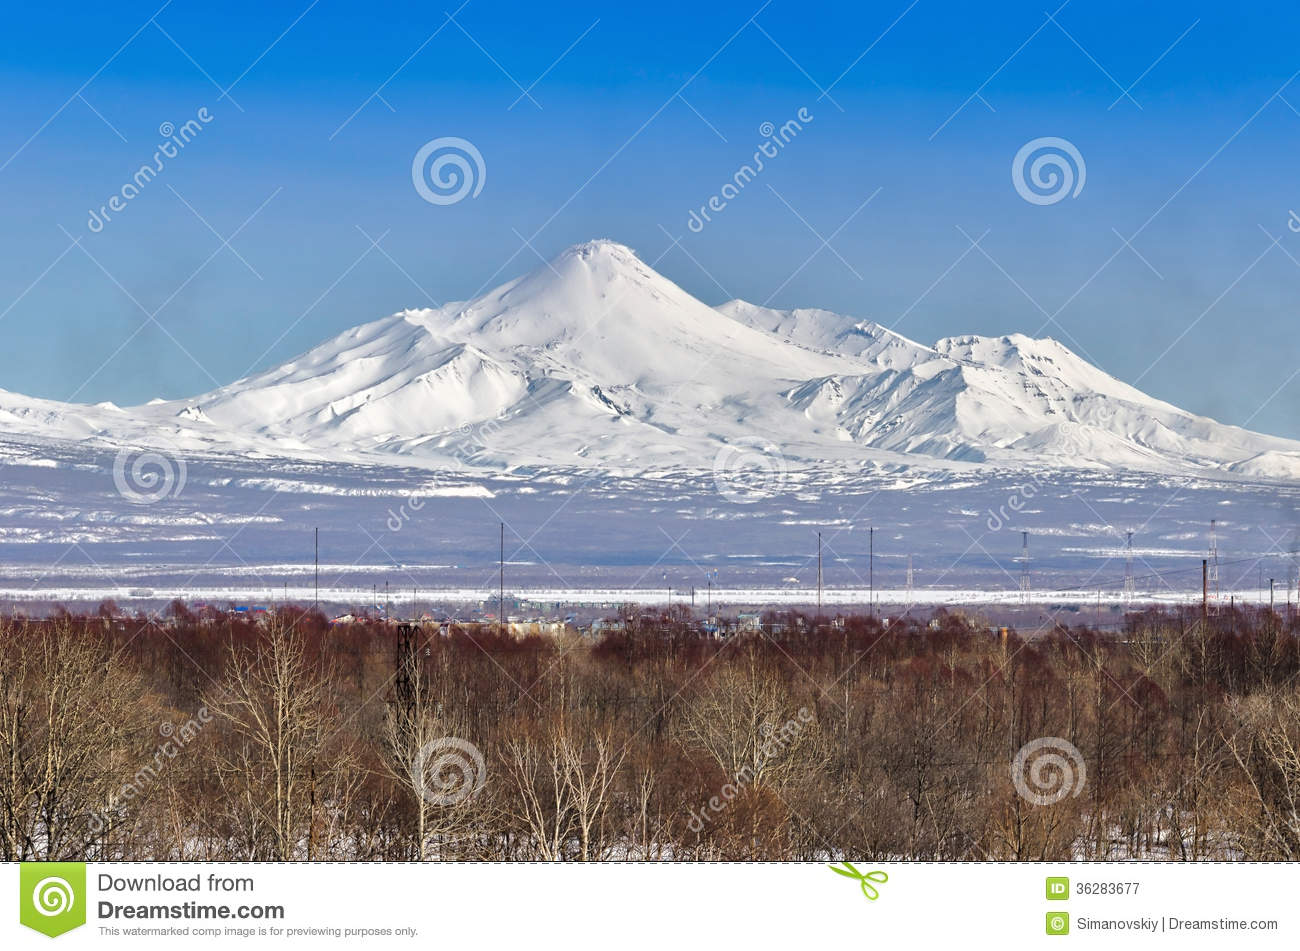 Kamchatka Peninsula clipart #13, Download drawings